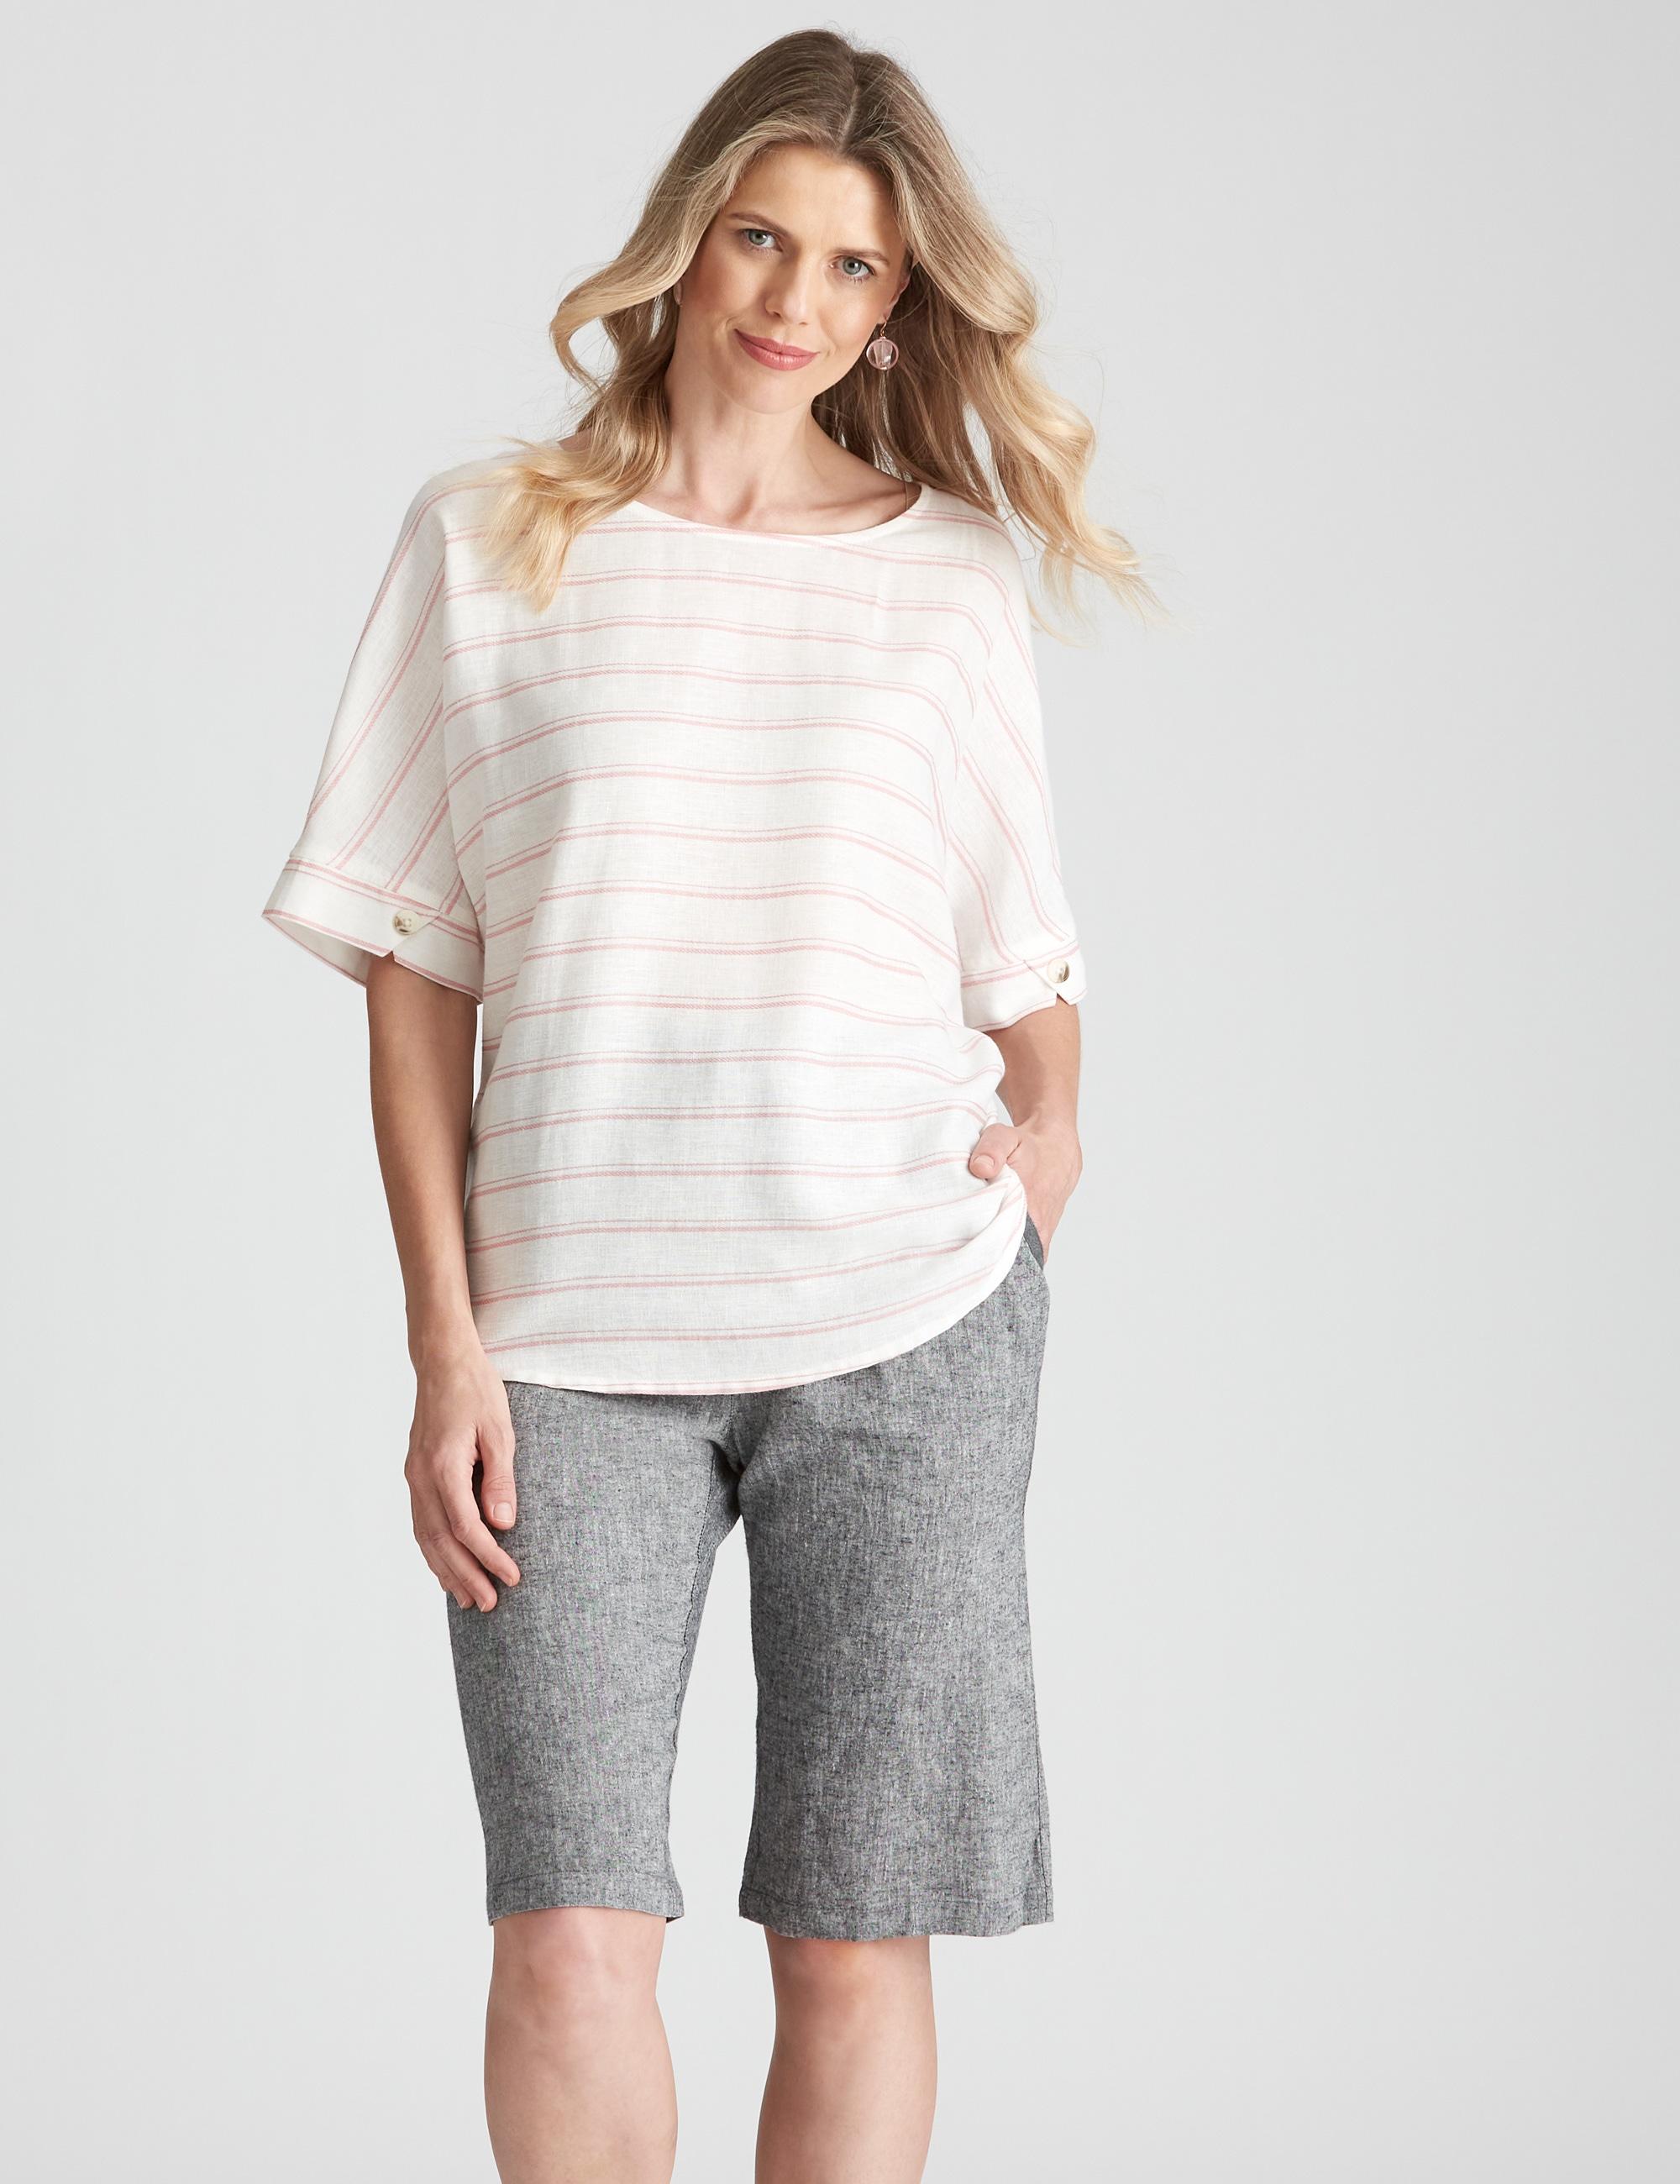 1056267660 1 - Women Fashion